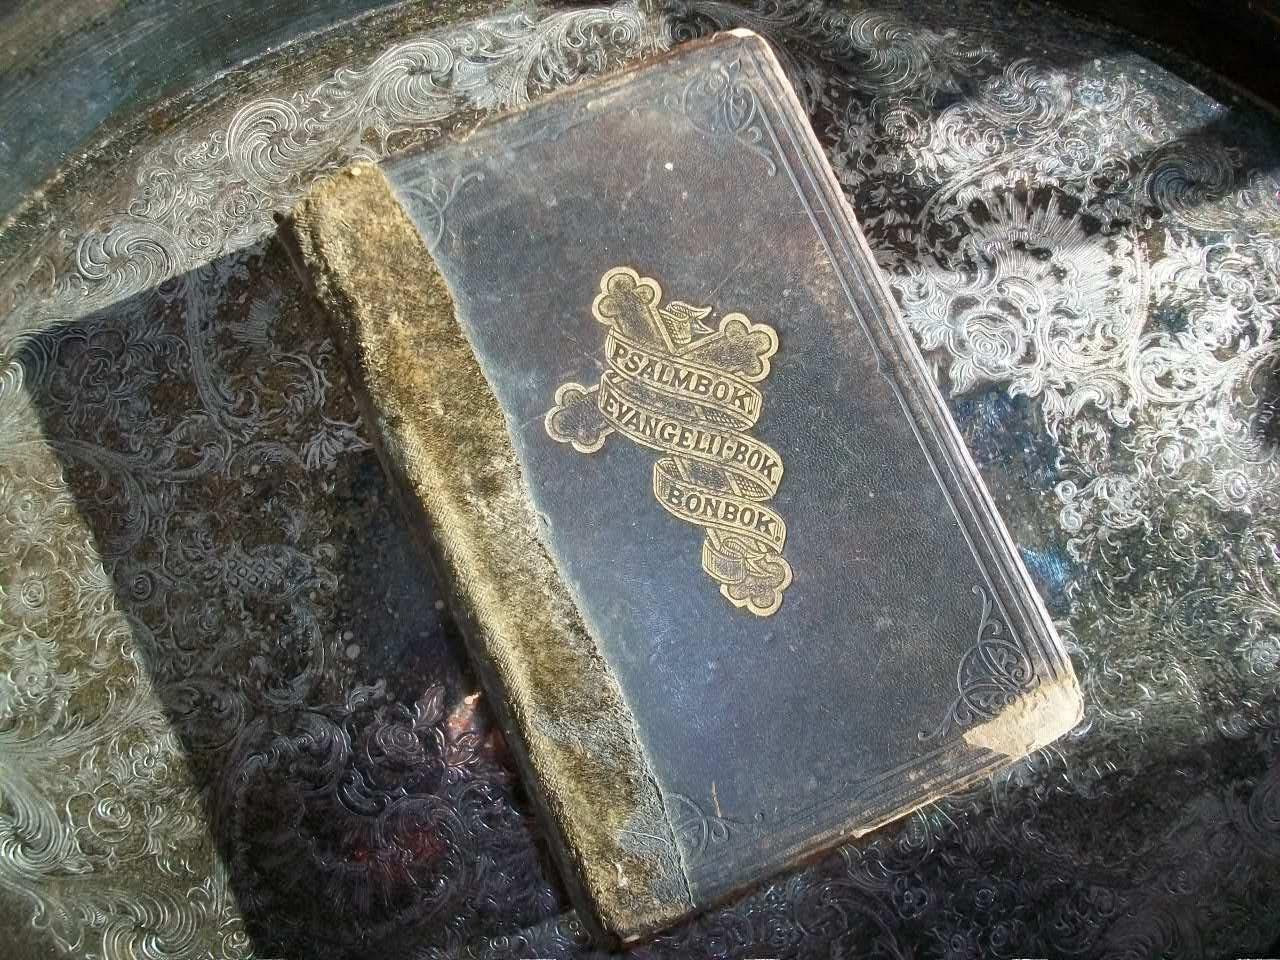 Antique Book 1879 Psalm Book Norwegian Psalmbok Evangelit Bok Bonbok - RedRiverAntiques